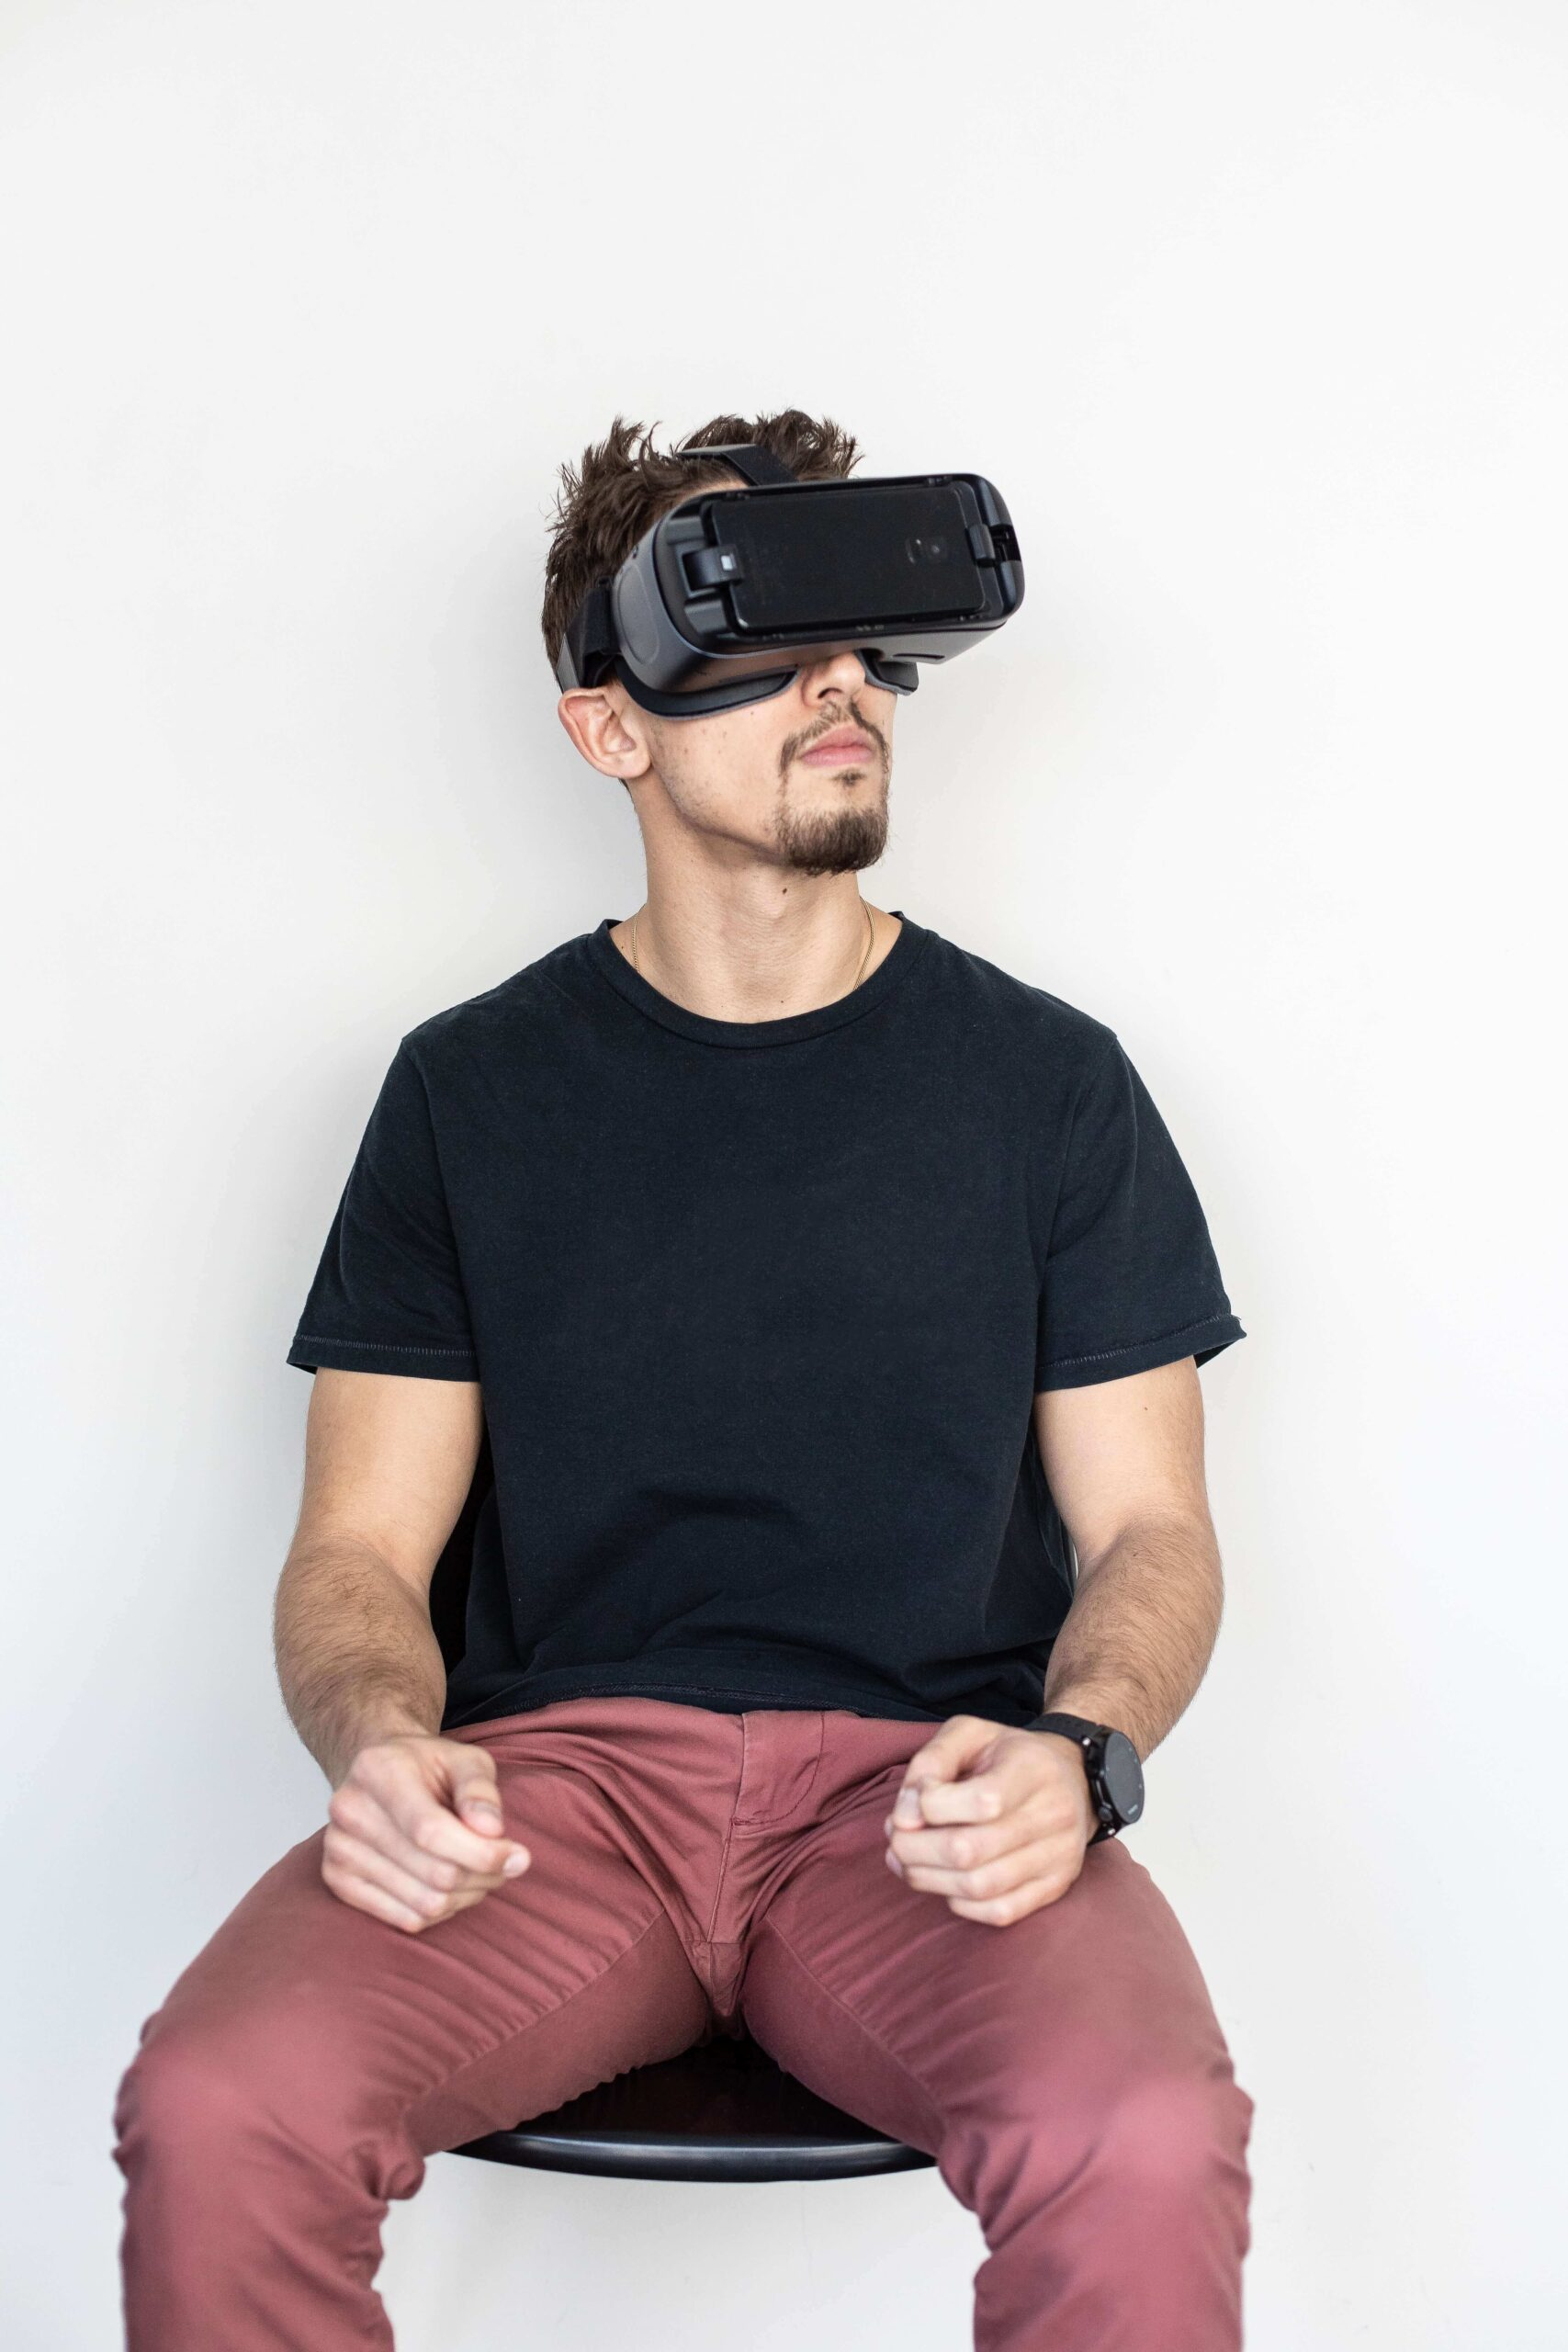 VR Single